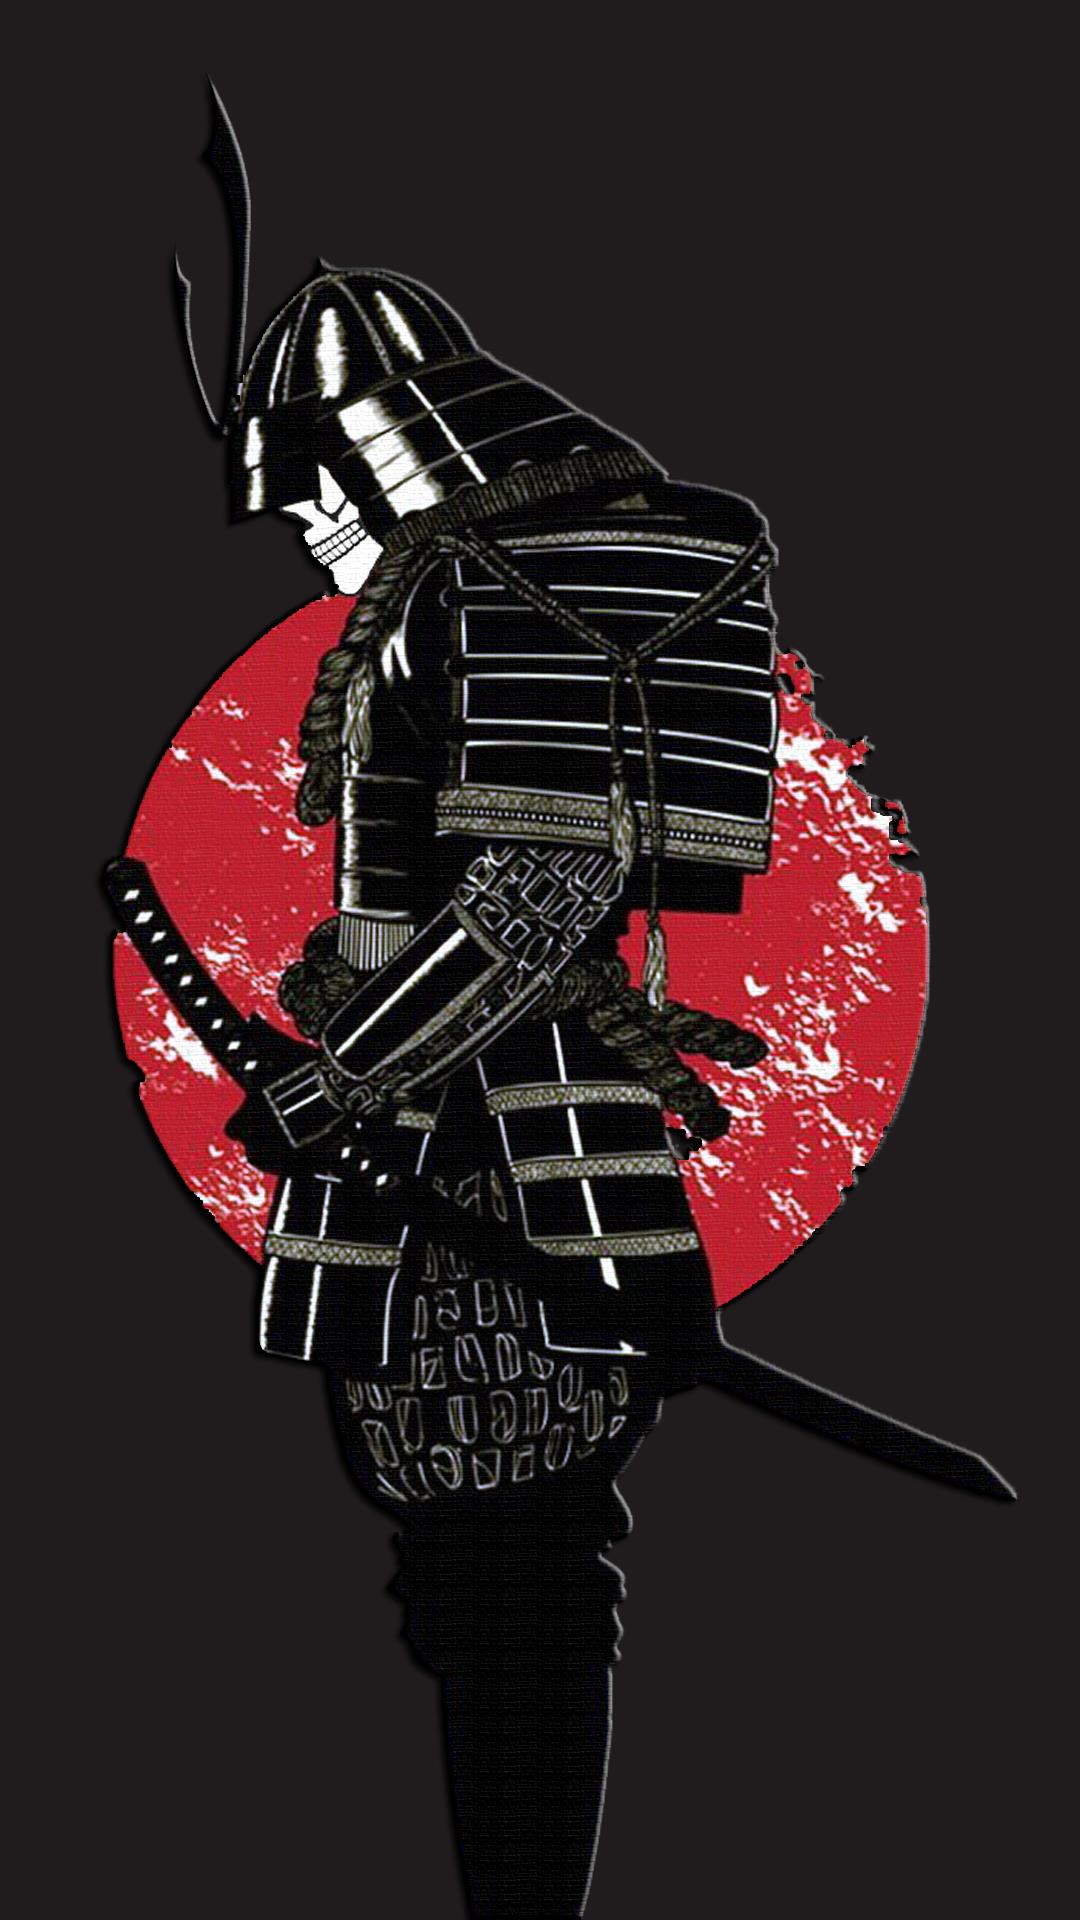 Japanese Samurai Girl Wallpaper Samurai Iphone Wallpaper Supportive Guru